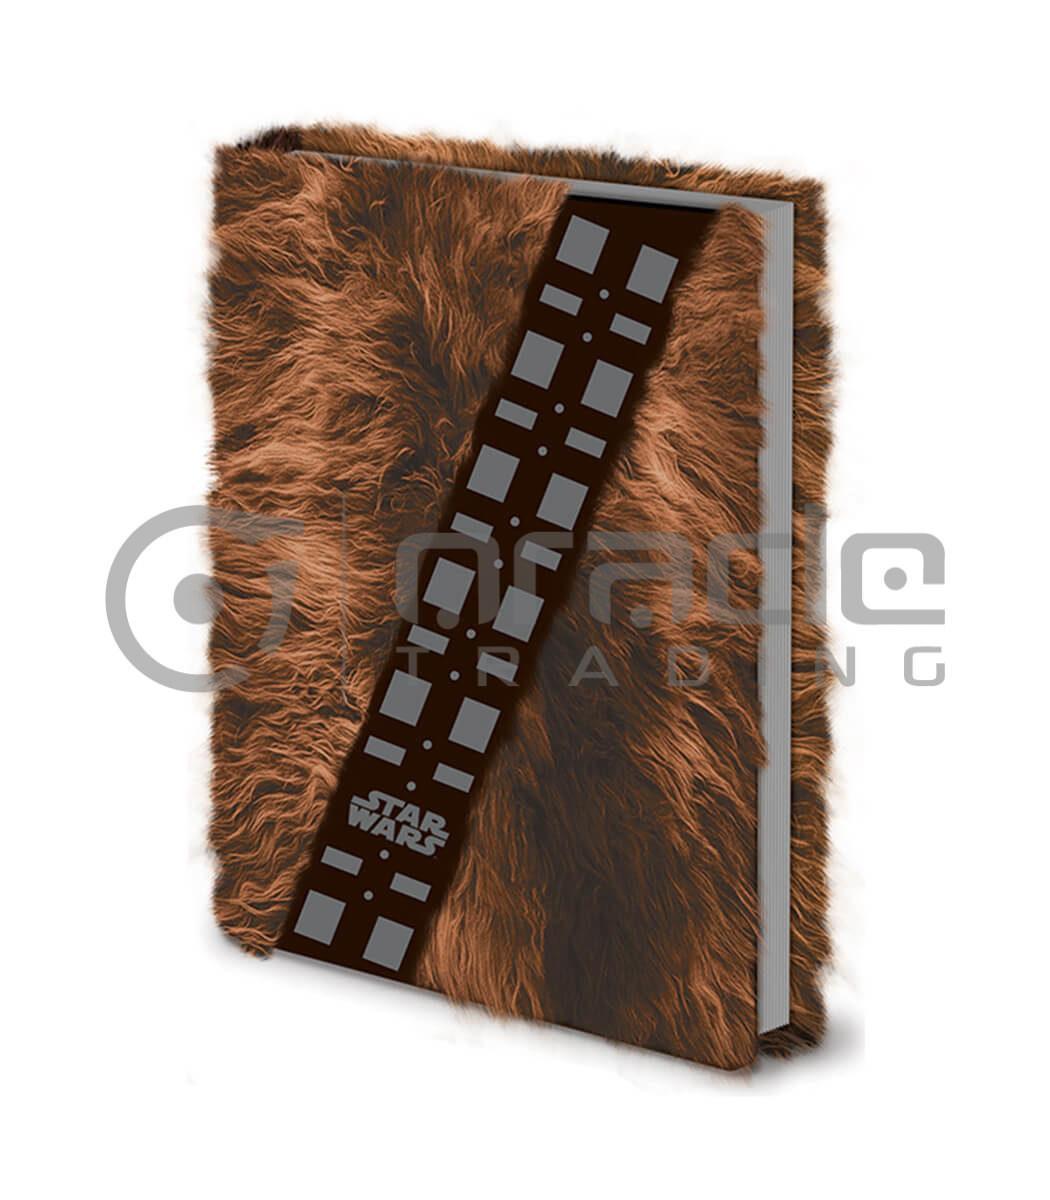 Star Wars Chewbacca Furry Notebook (Premium)